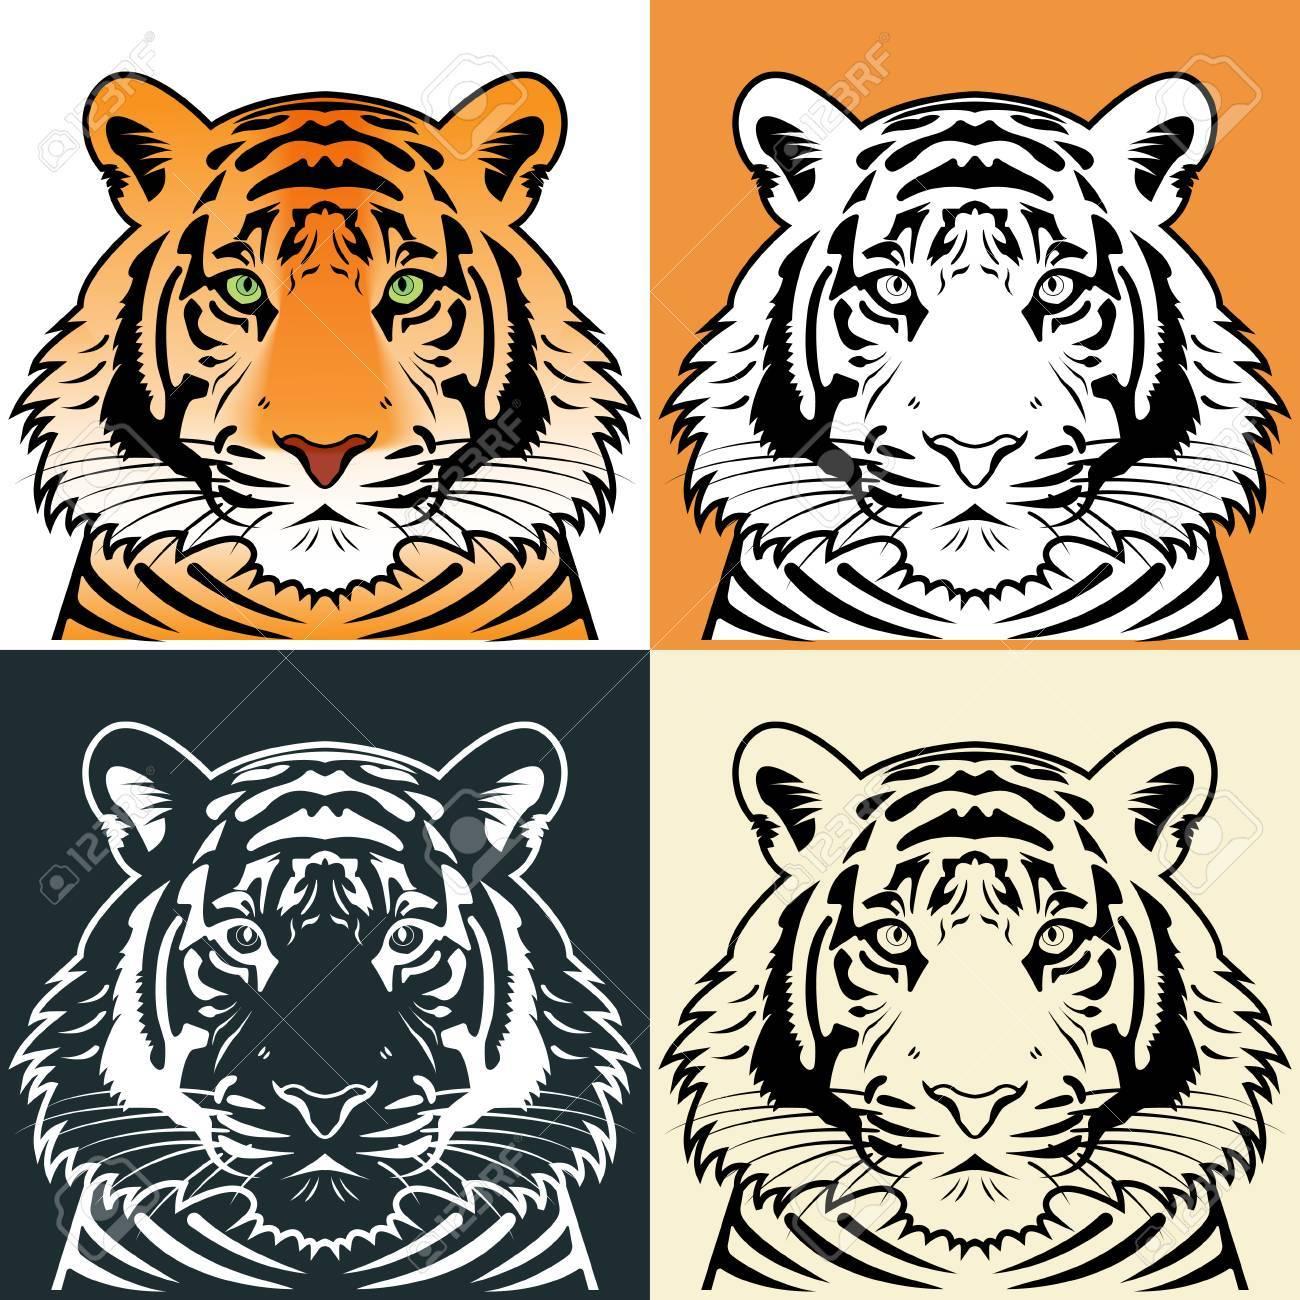 Tiger head silhouette illustration - 30579388